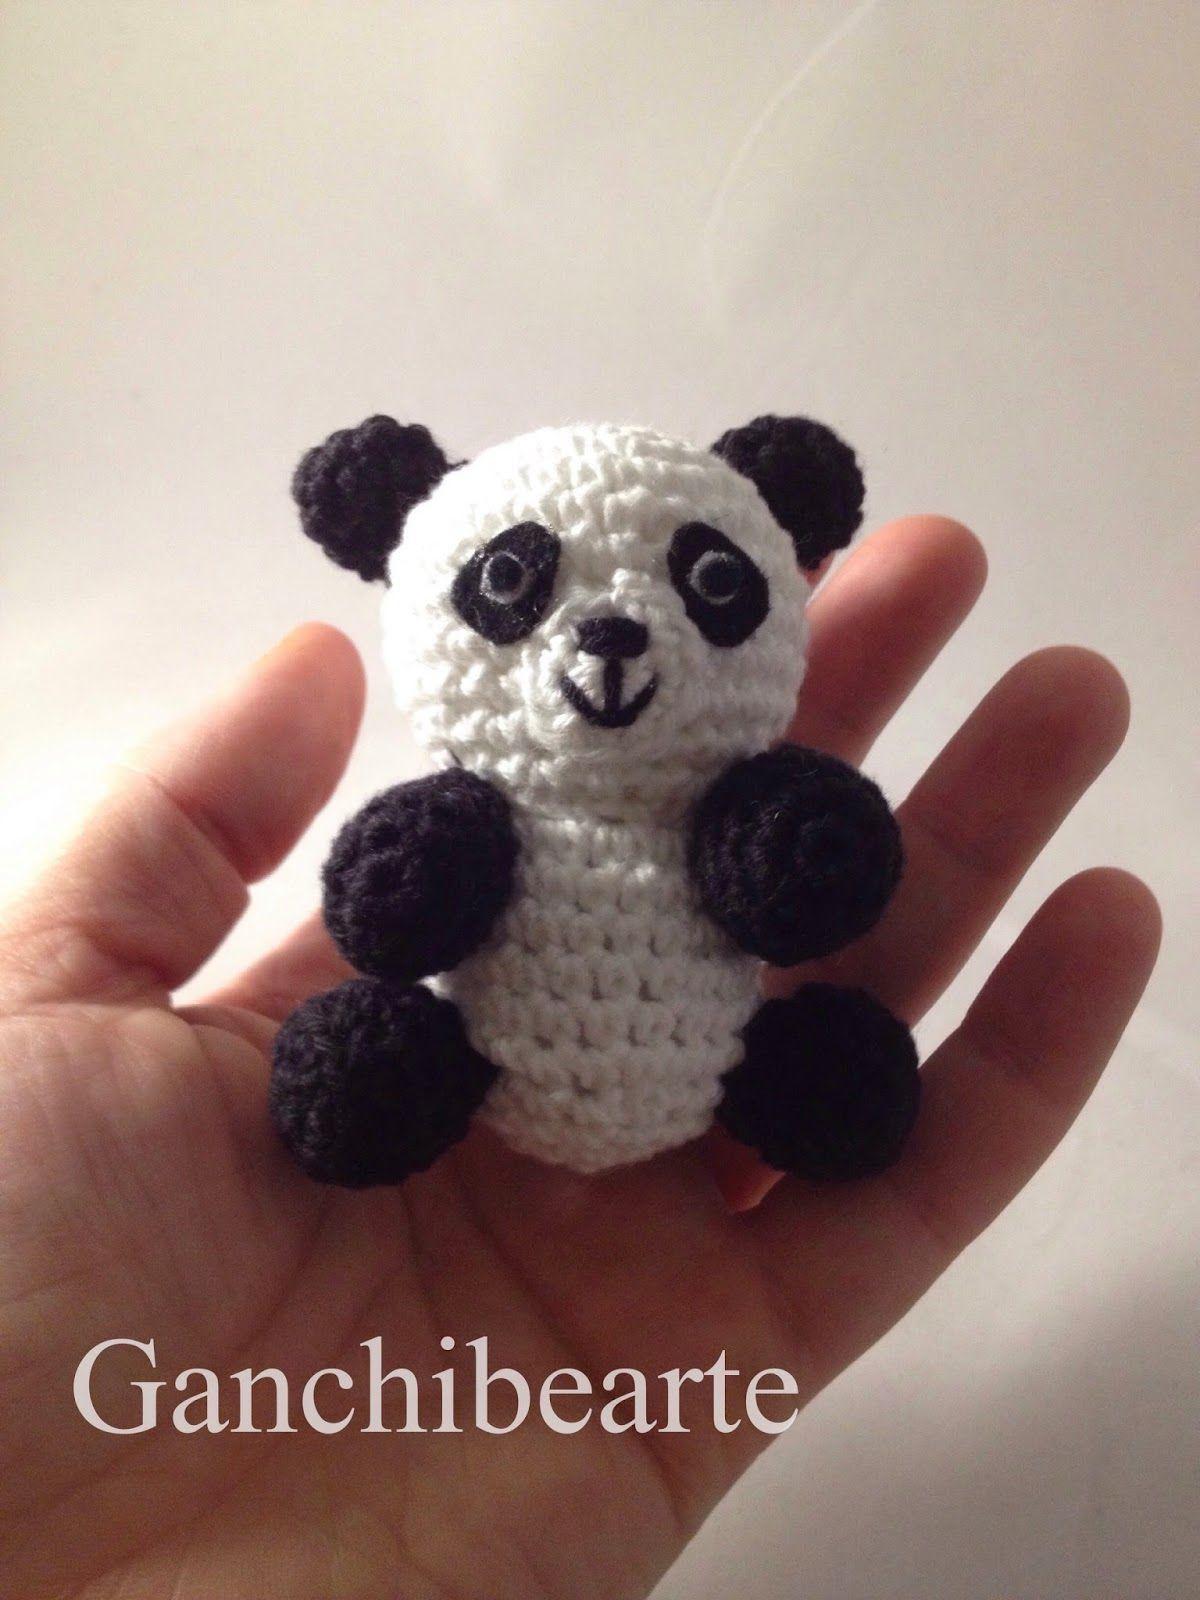 Llavero Oso Panda - Souvenirs para No es comestible en Bs.As ... | 1600x1200